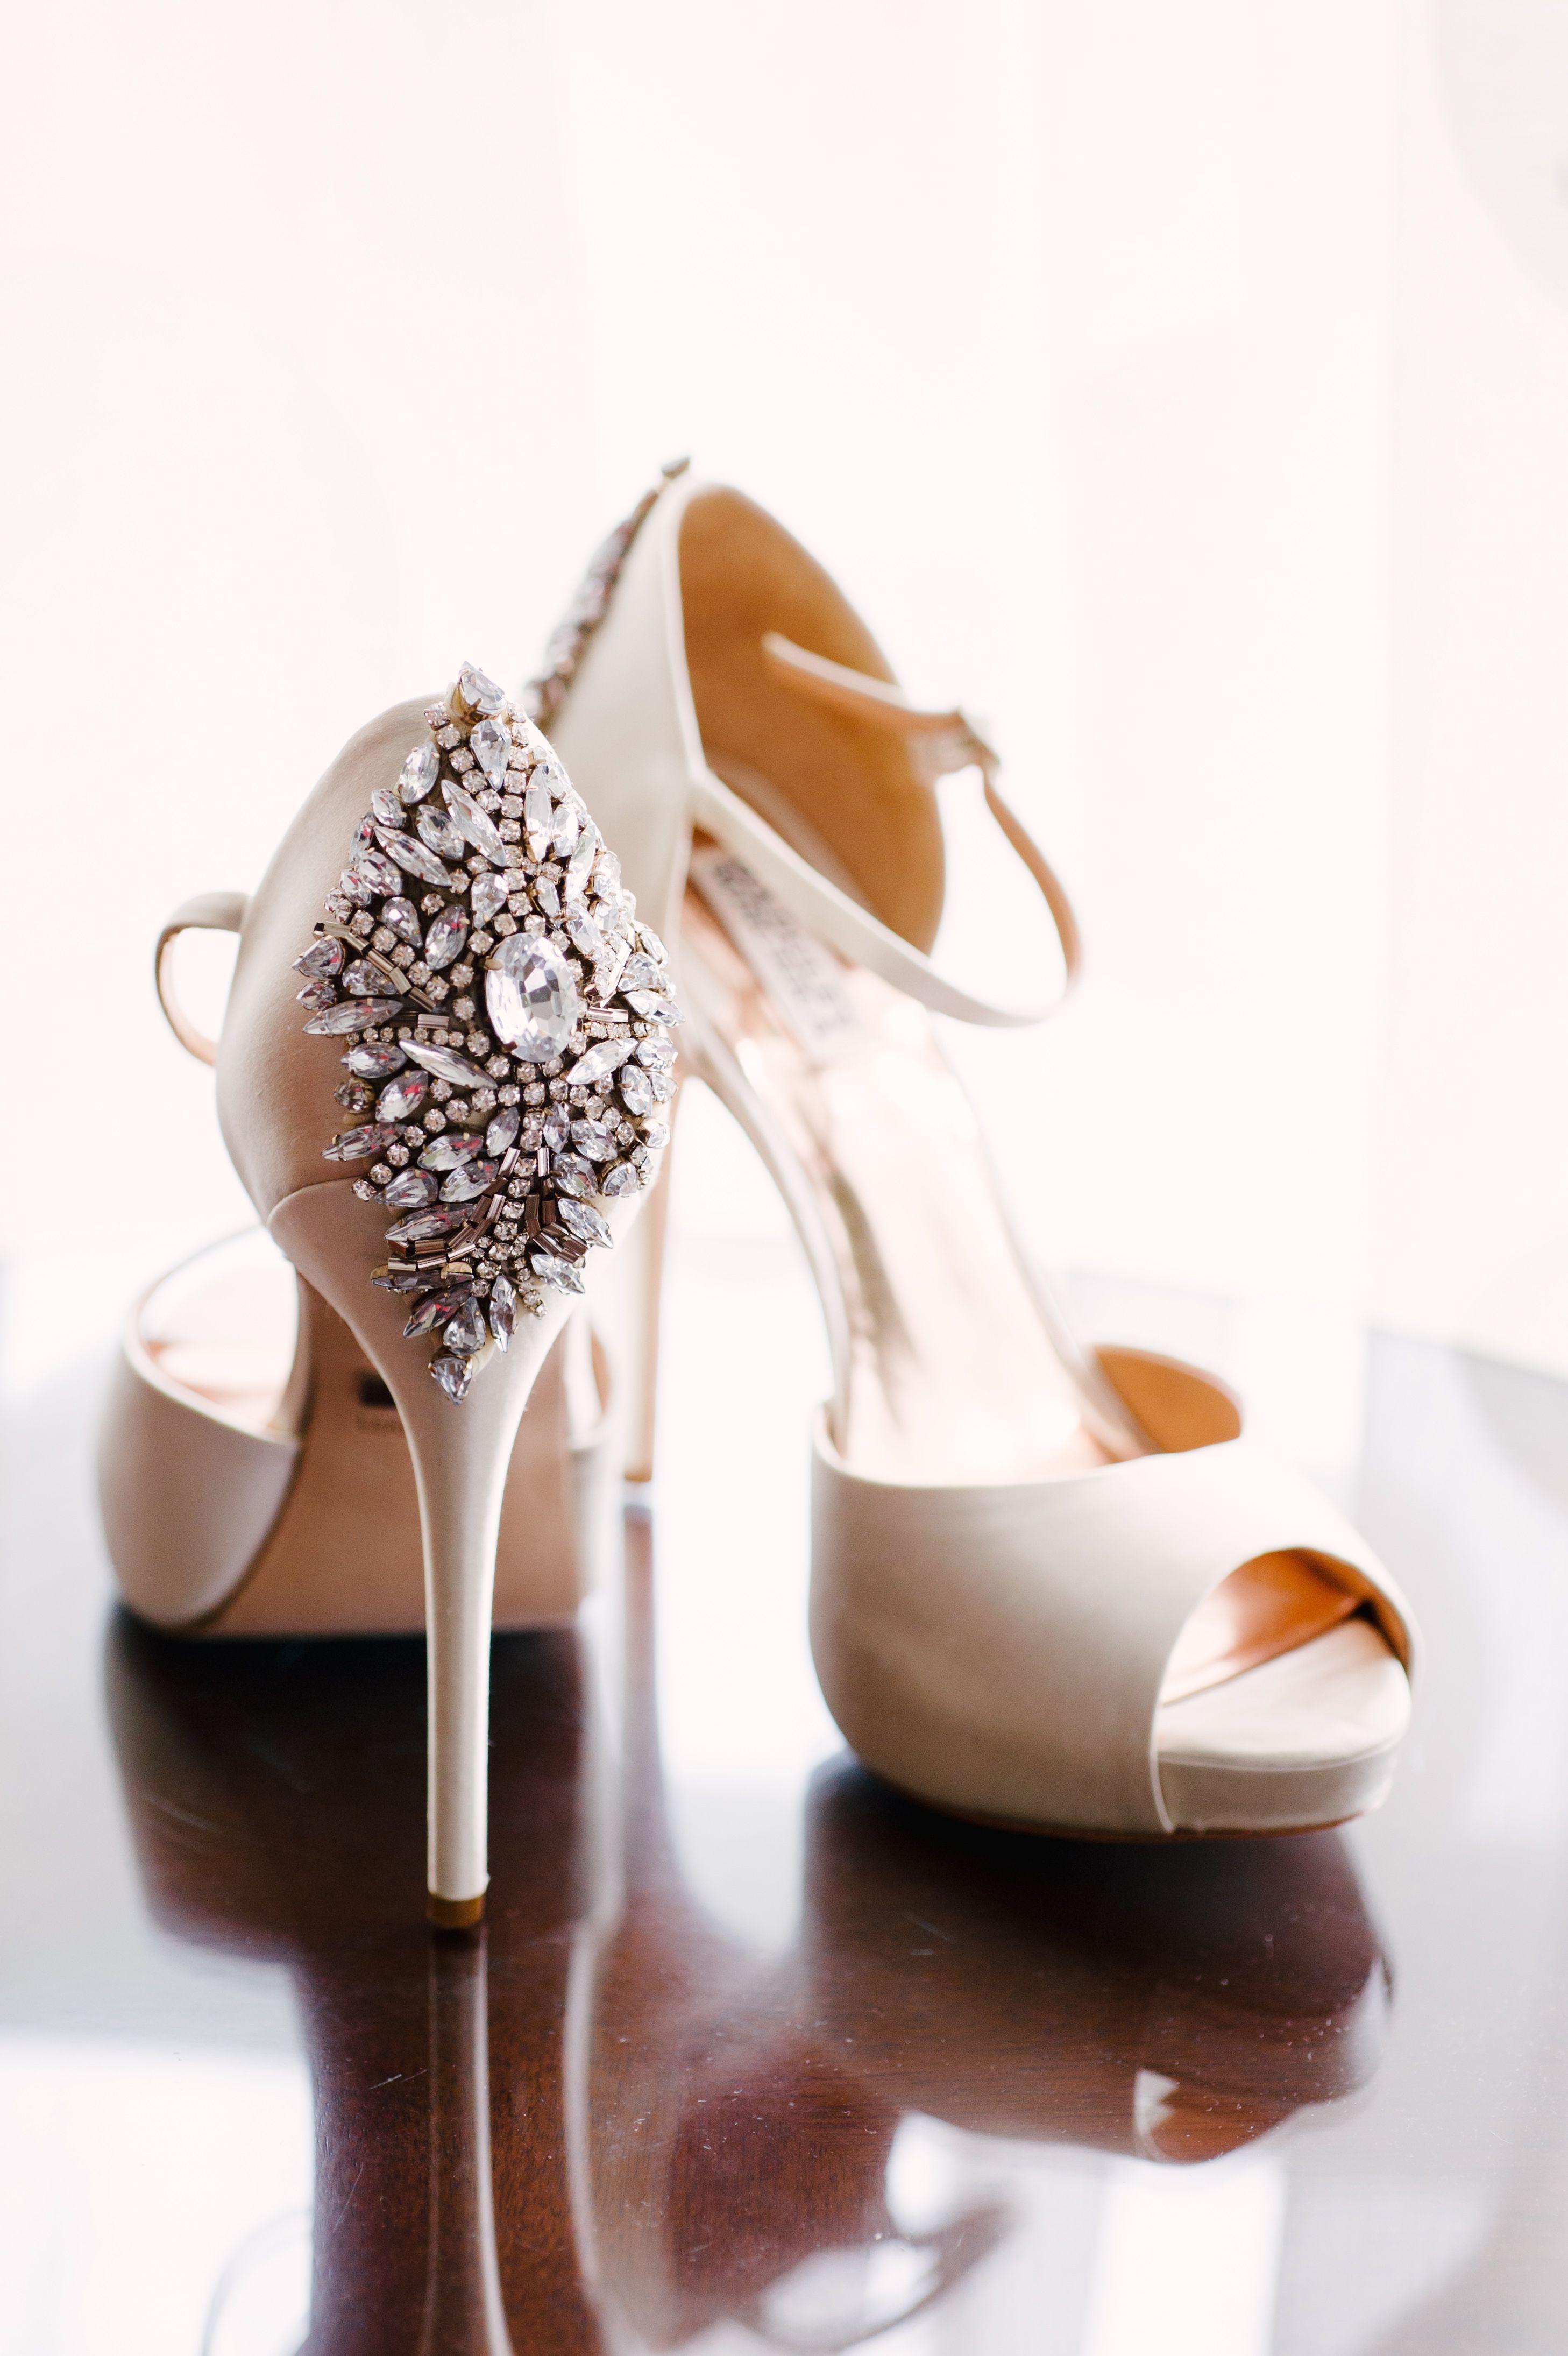 Badgley Mischka Crystal-Detailed Neutral Wedding Shoes